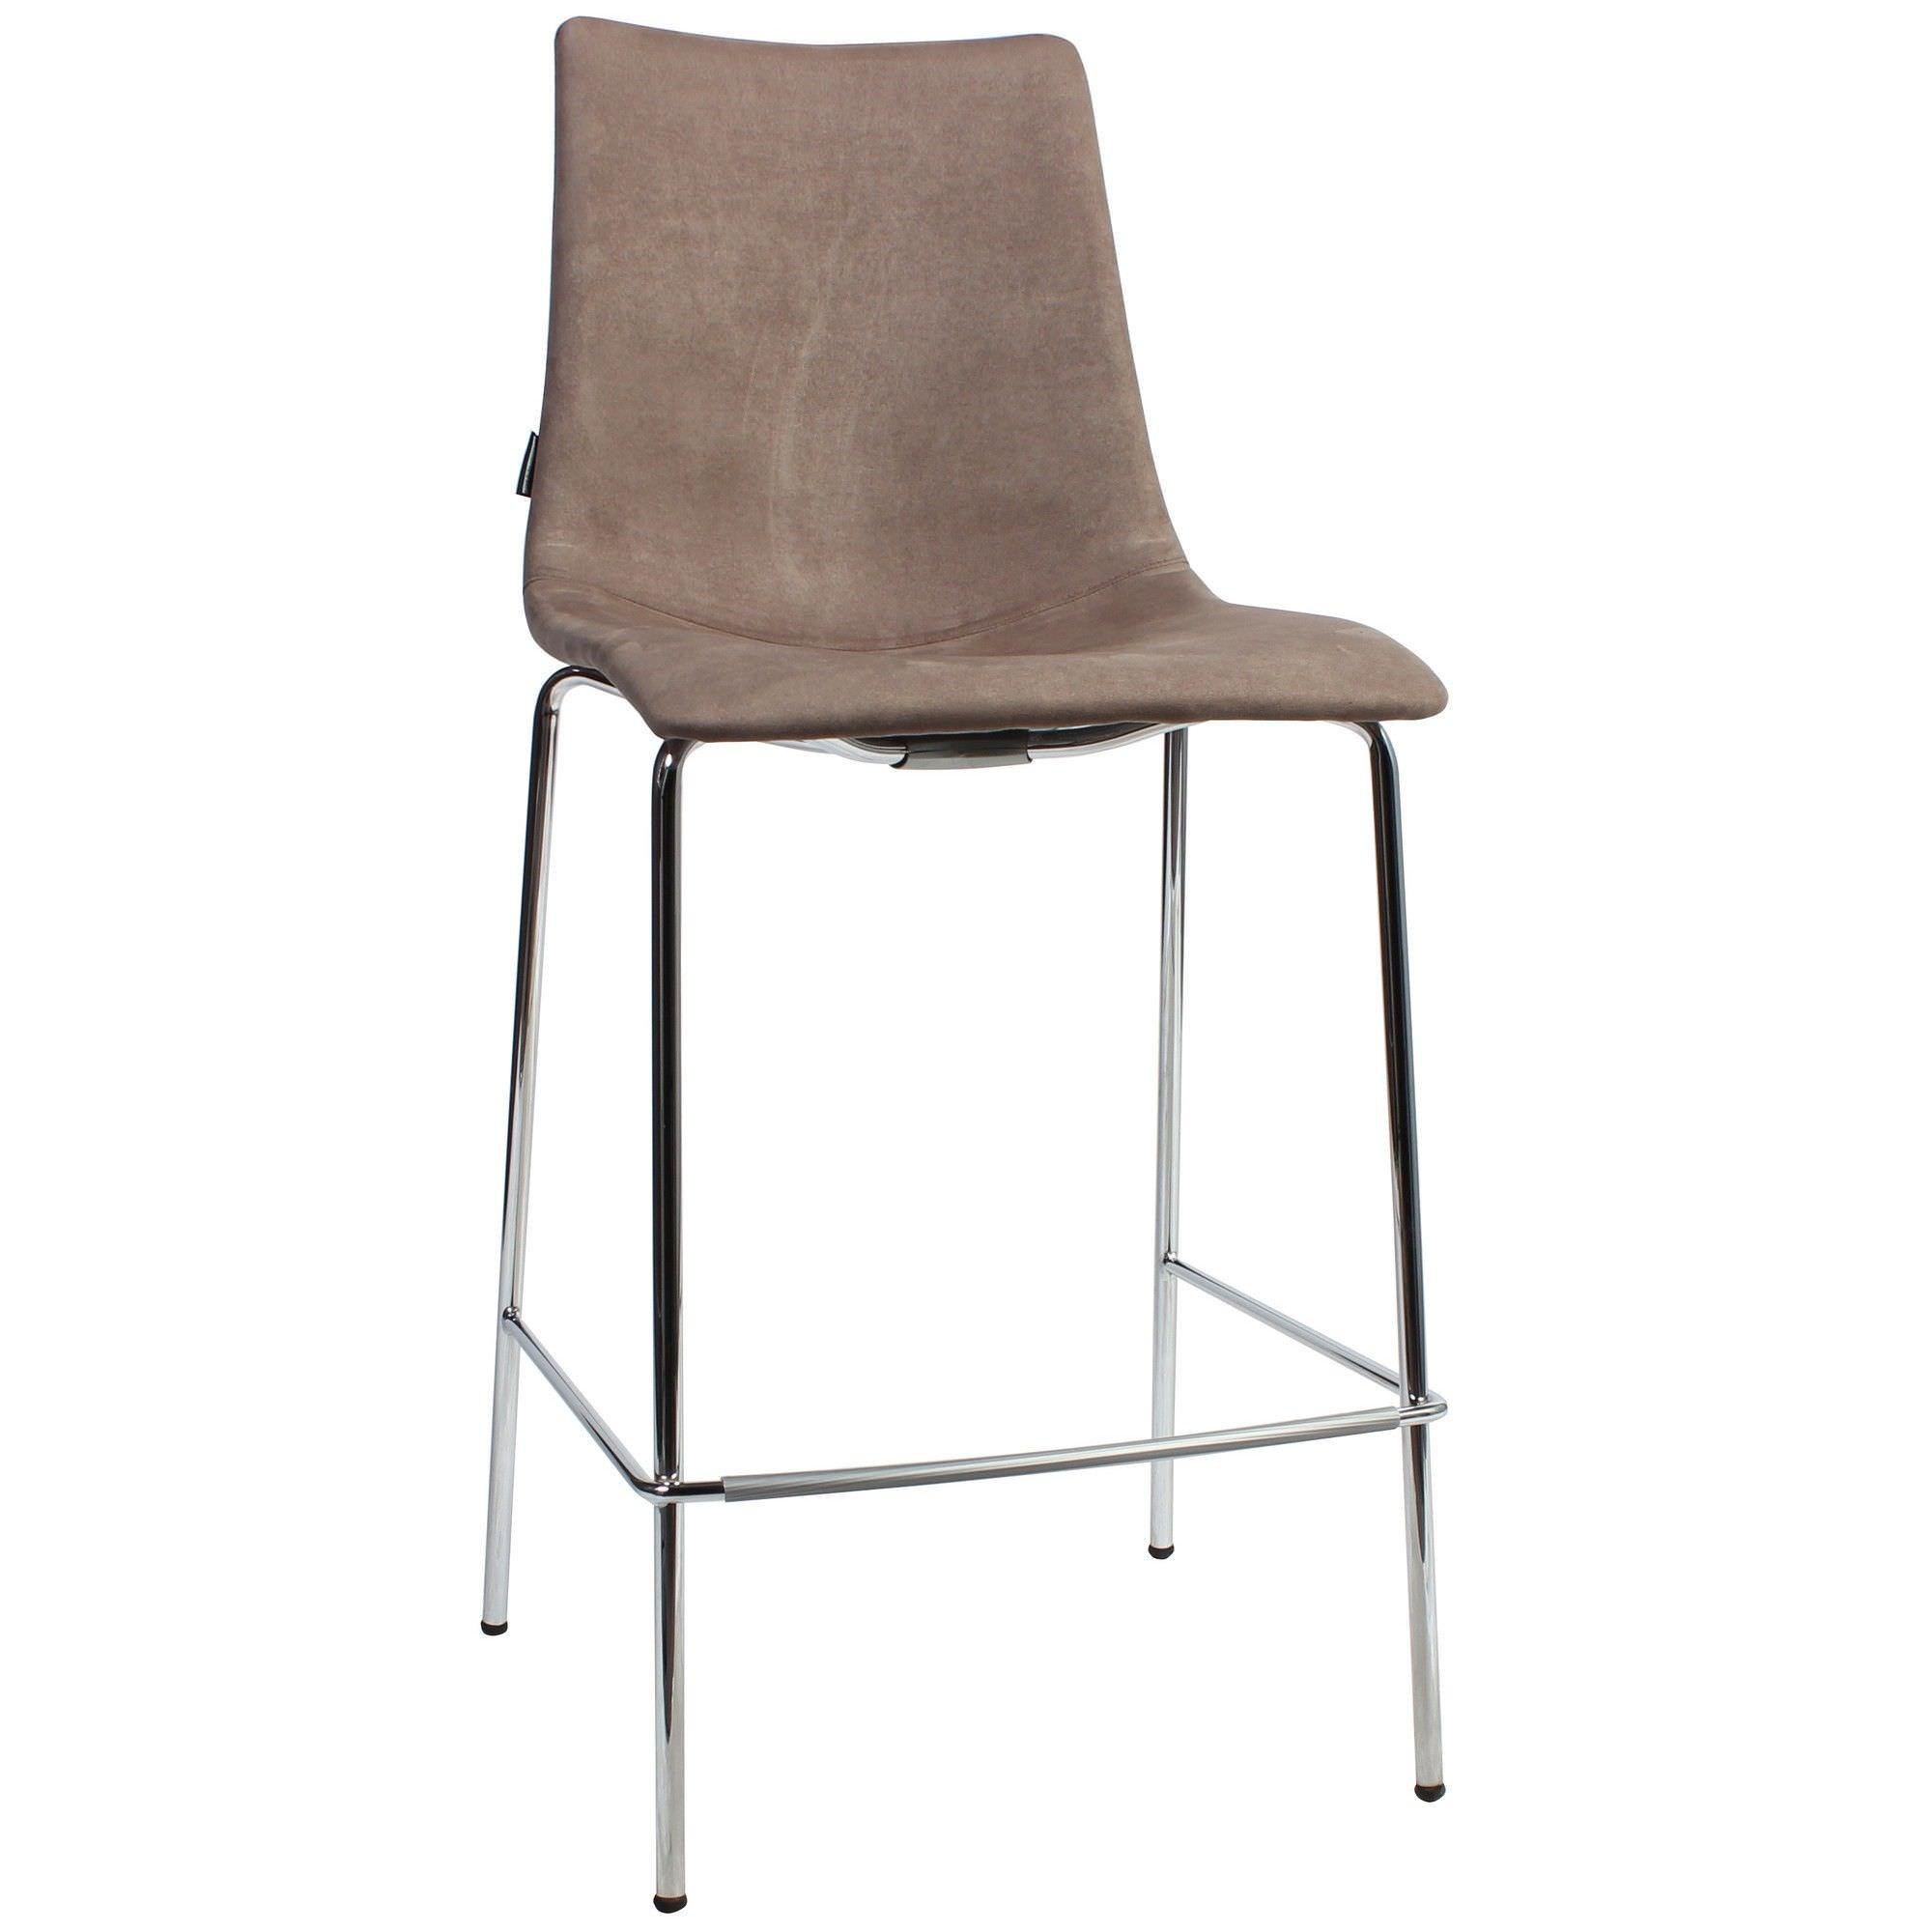 Zebra Pop Italian Made Commercial Grade Fabric Counter Stool, Metal Leg, Brown / Chrome